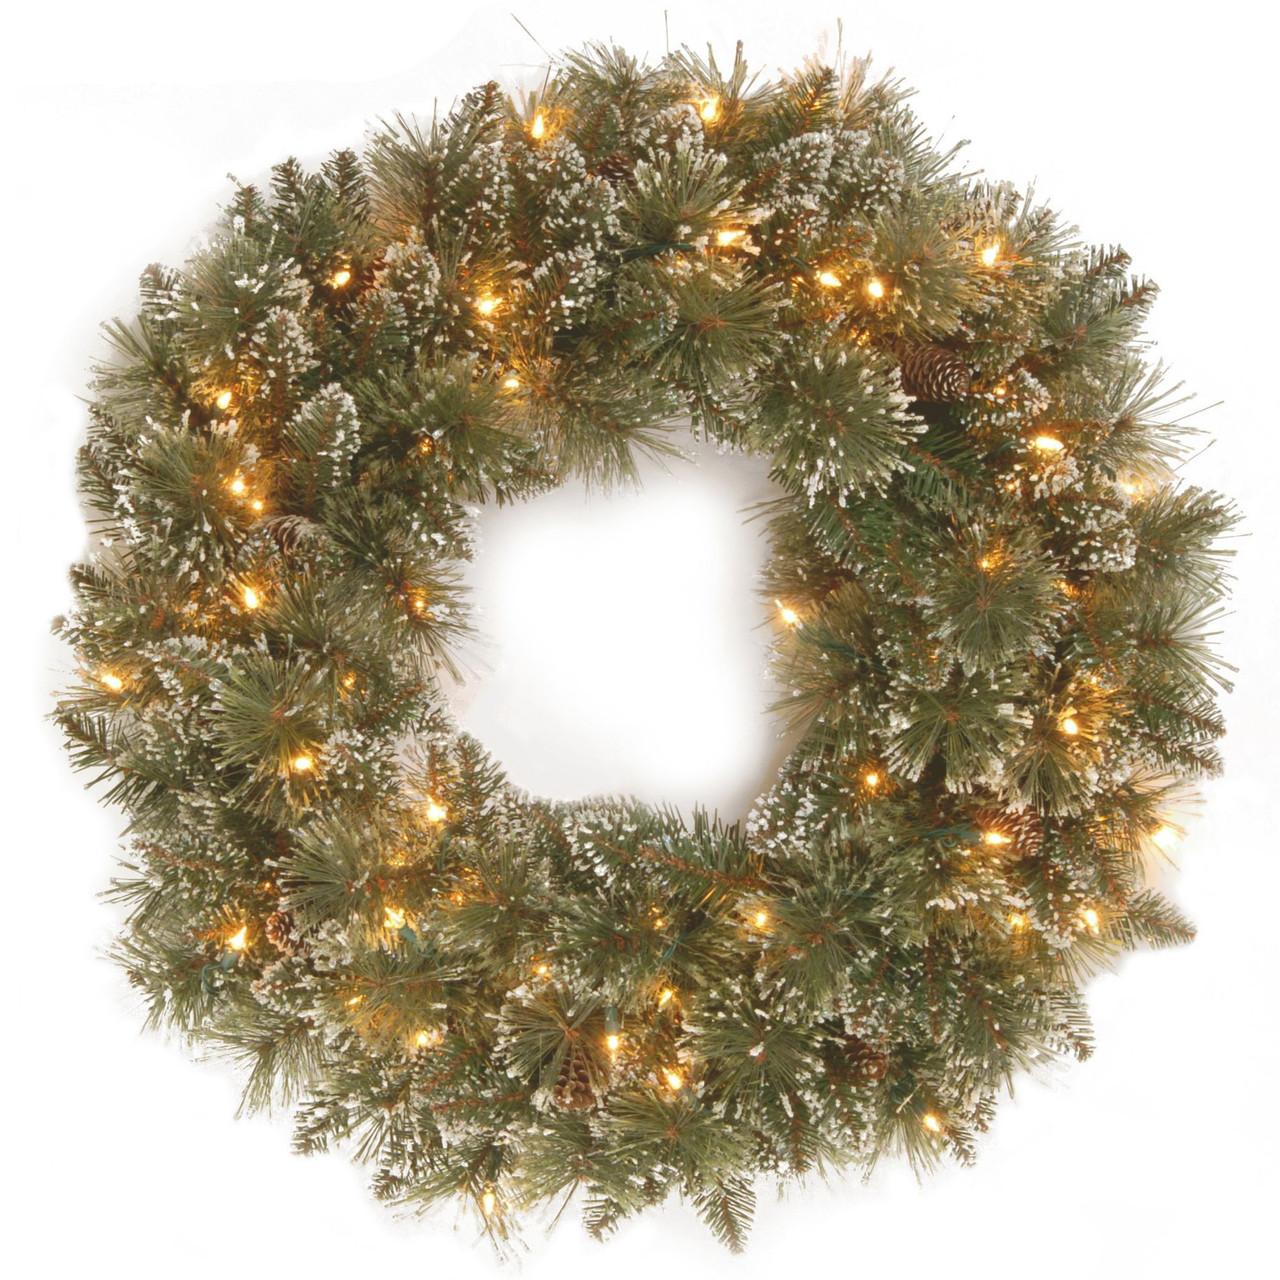 30-Inch Pre-Lit Glittery Bristle Pine Artificial Christmas Wreath Clear Lights